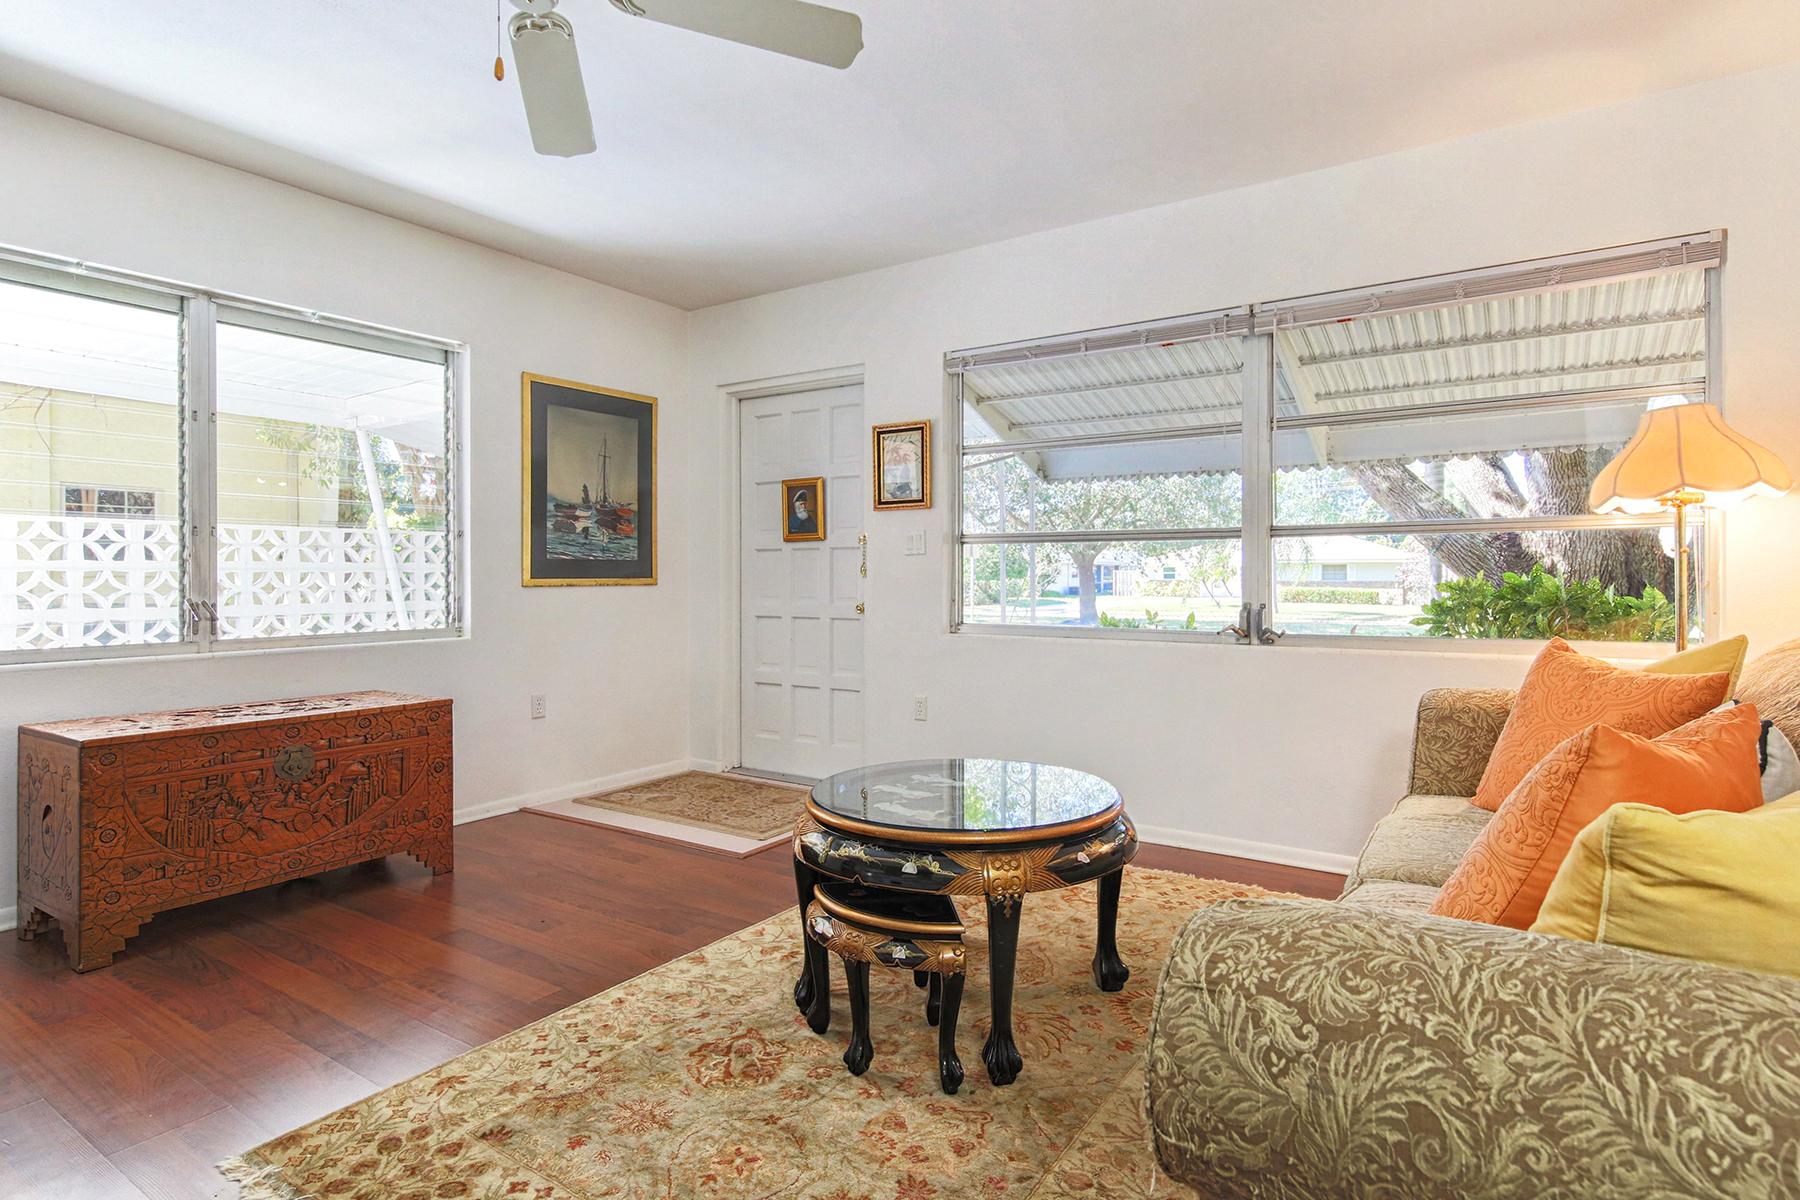 Additional photo for property listing at VENEZIA PARK - VENICE ISLAND 429  Harbor Dr  S,  Venice, Florida 34285 United States